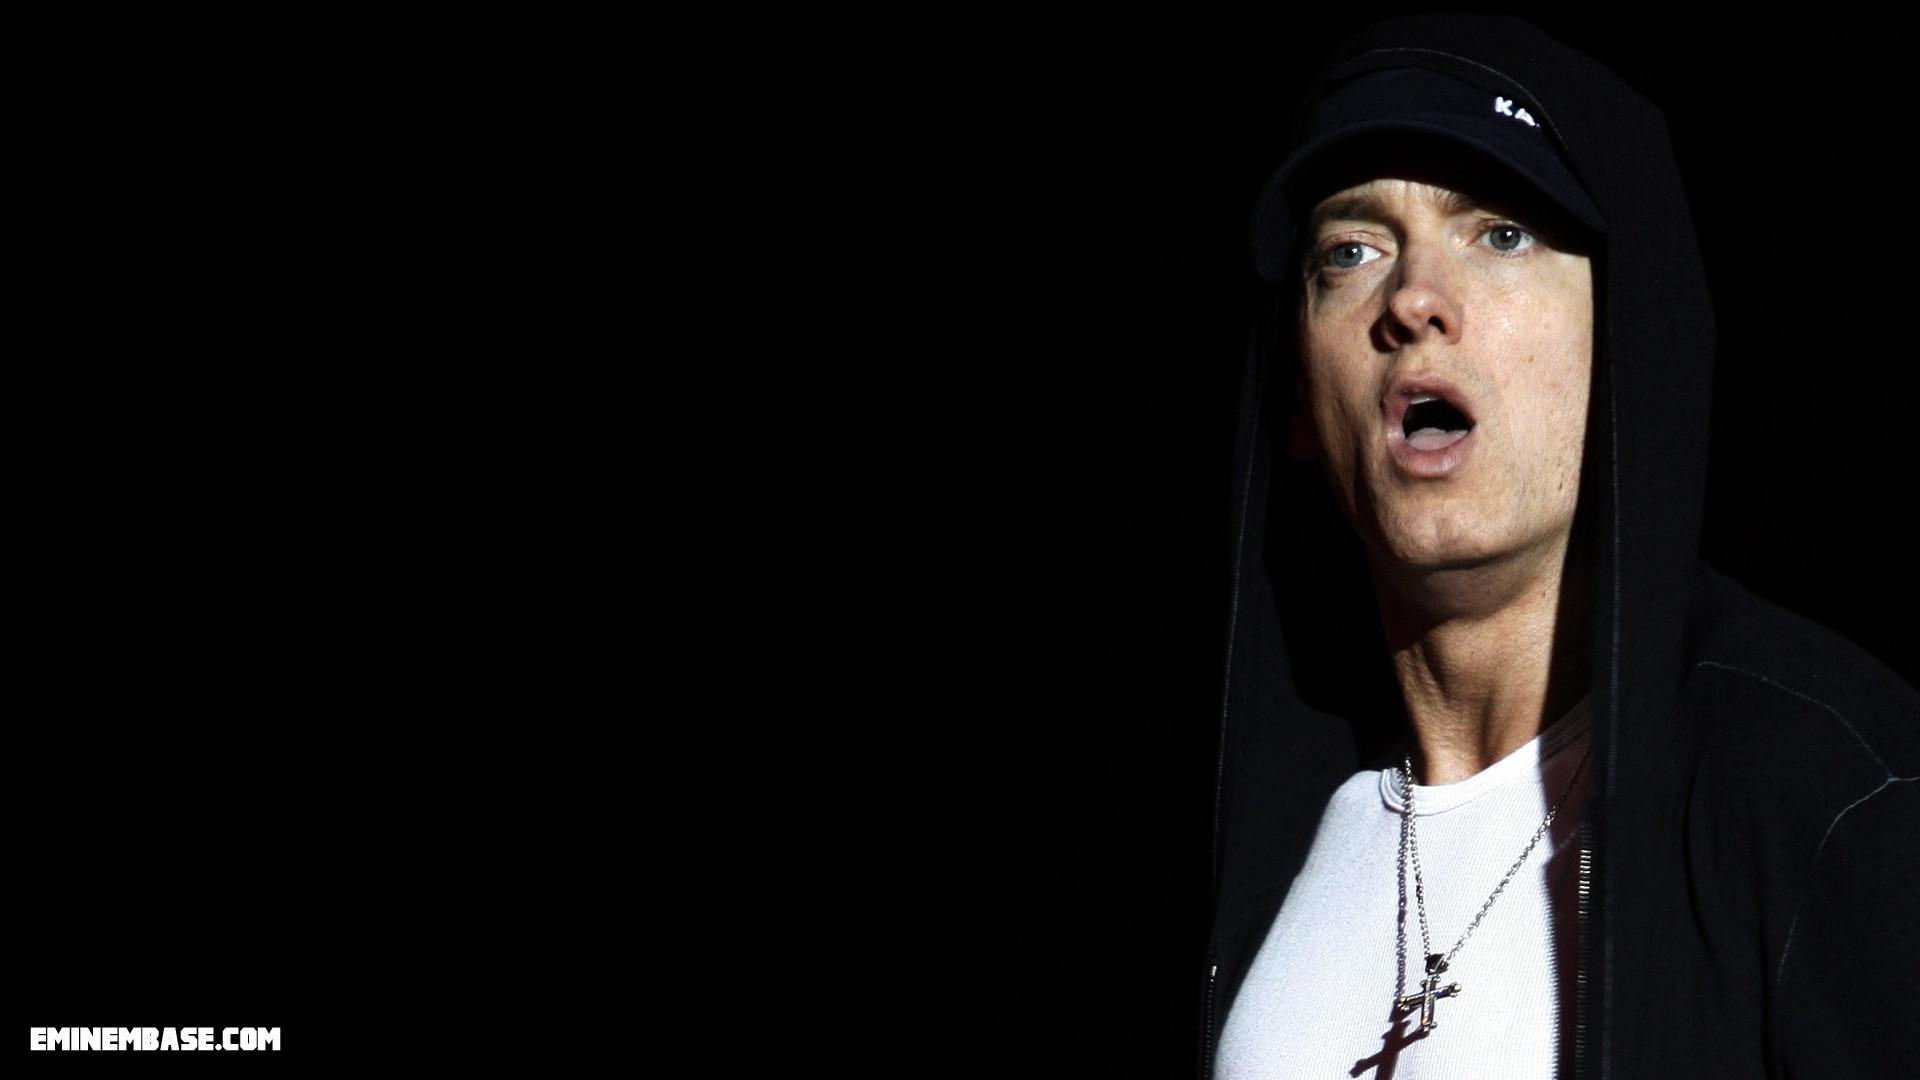 Download Wallpaper Logo Eminem - 963419-cool-eminem-2018-wallpaper-recovery-1920x1080-for-mac  HD_307056.jpg